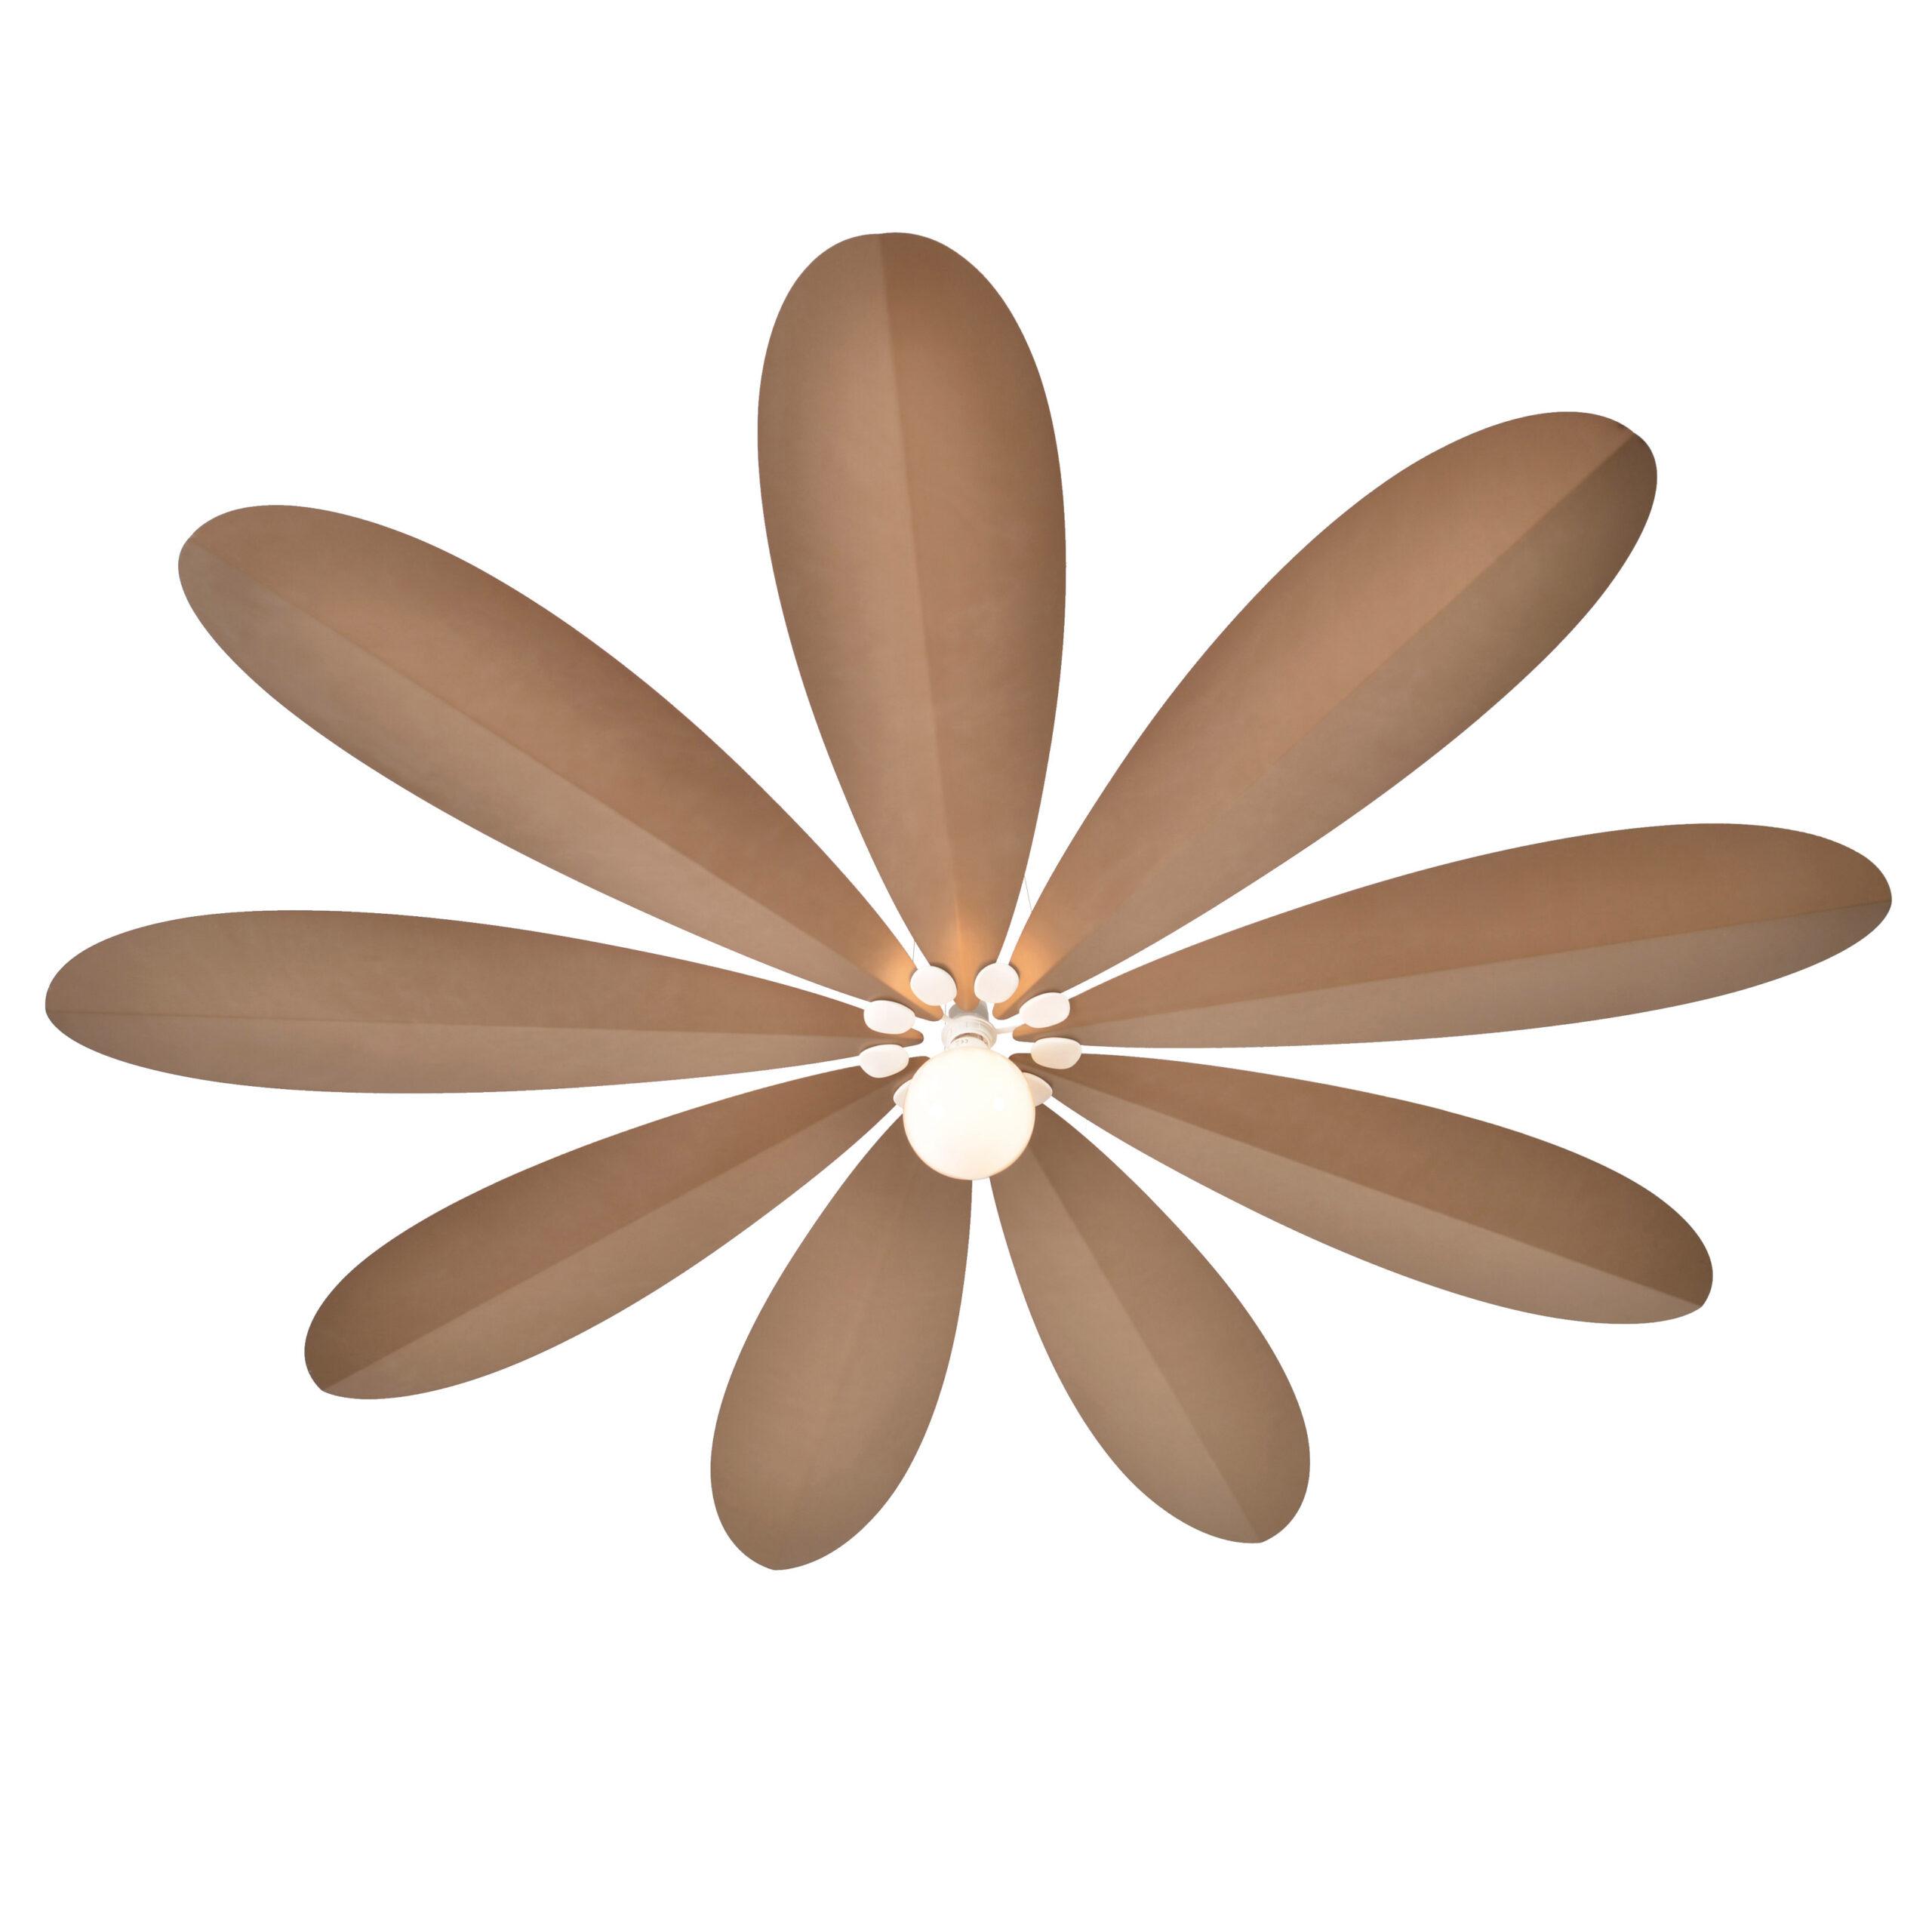 BELA LUGA SOKO Model: LMAGN1GA170 Color: Copper Gold anodized Size: L:1,7m W:1,7m H:0,22cm